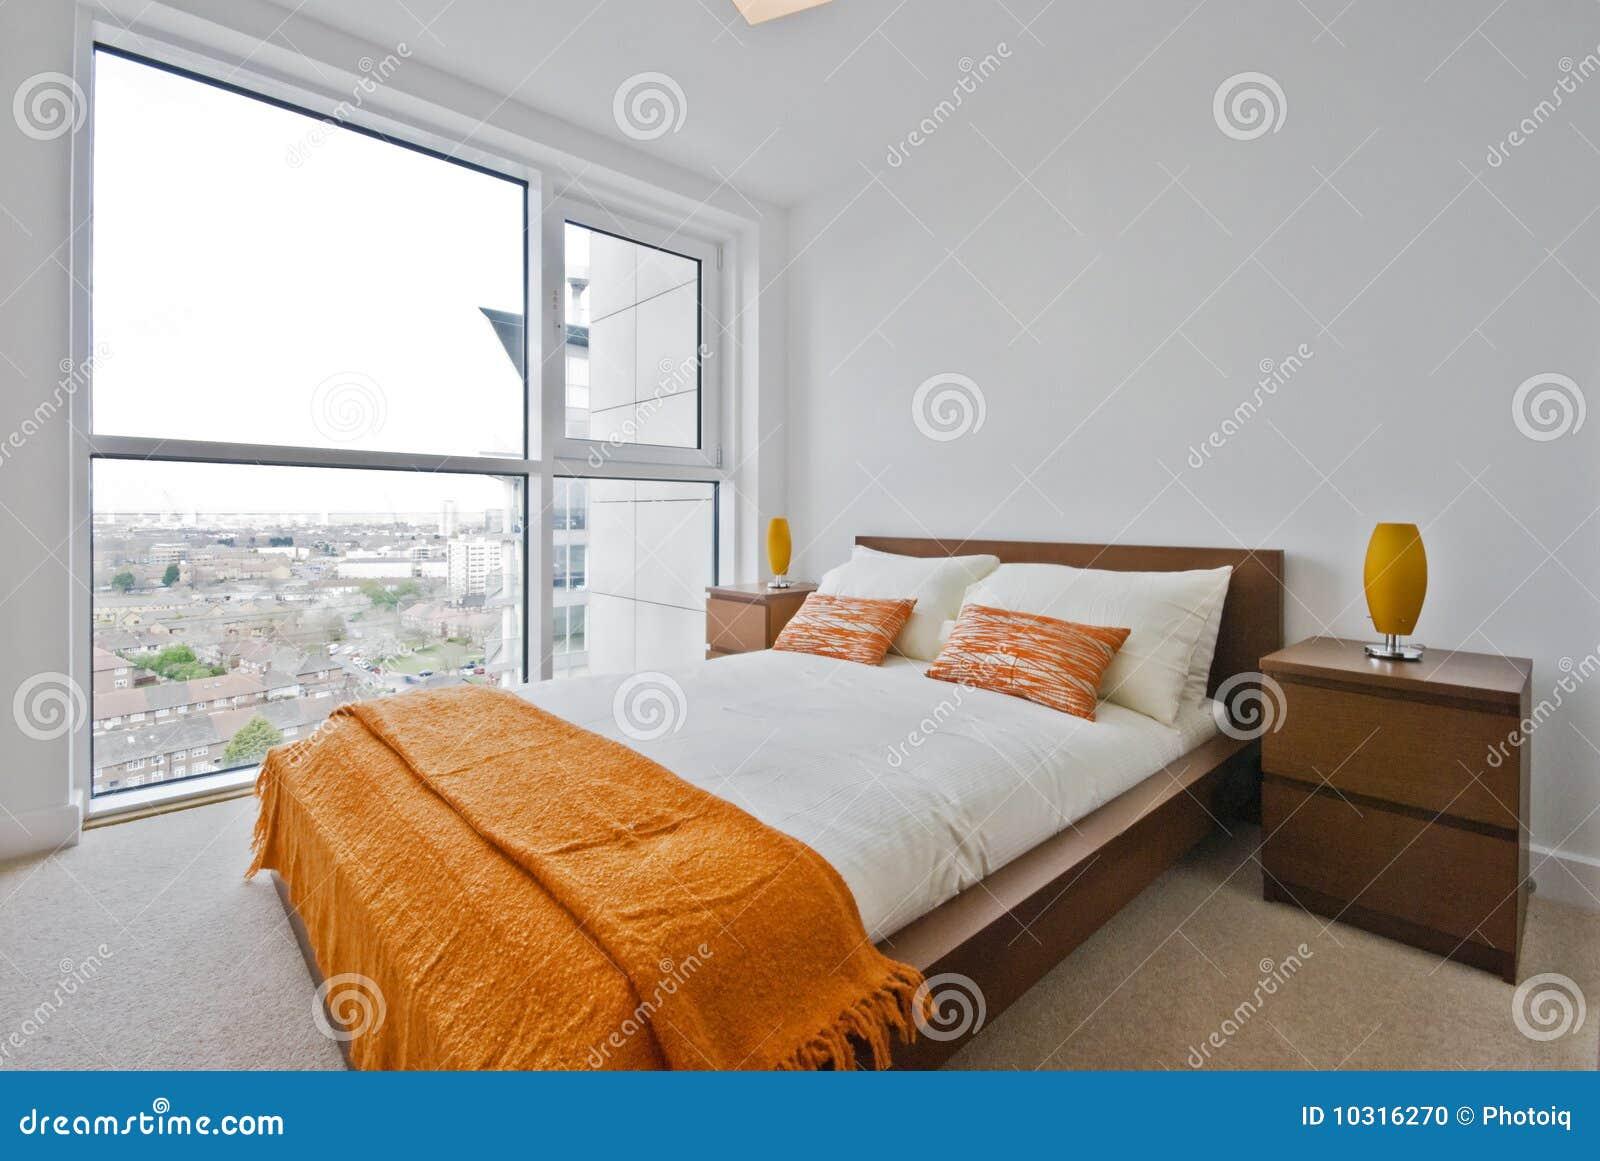 Bedroom with floor to ceiling windows stock photo image for Cost of floor to ceiling windows